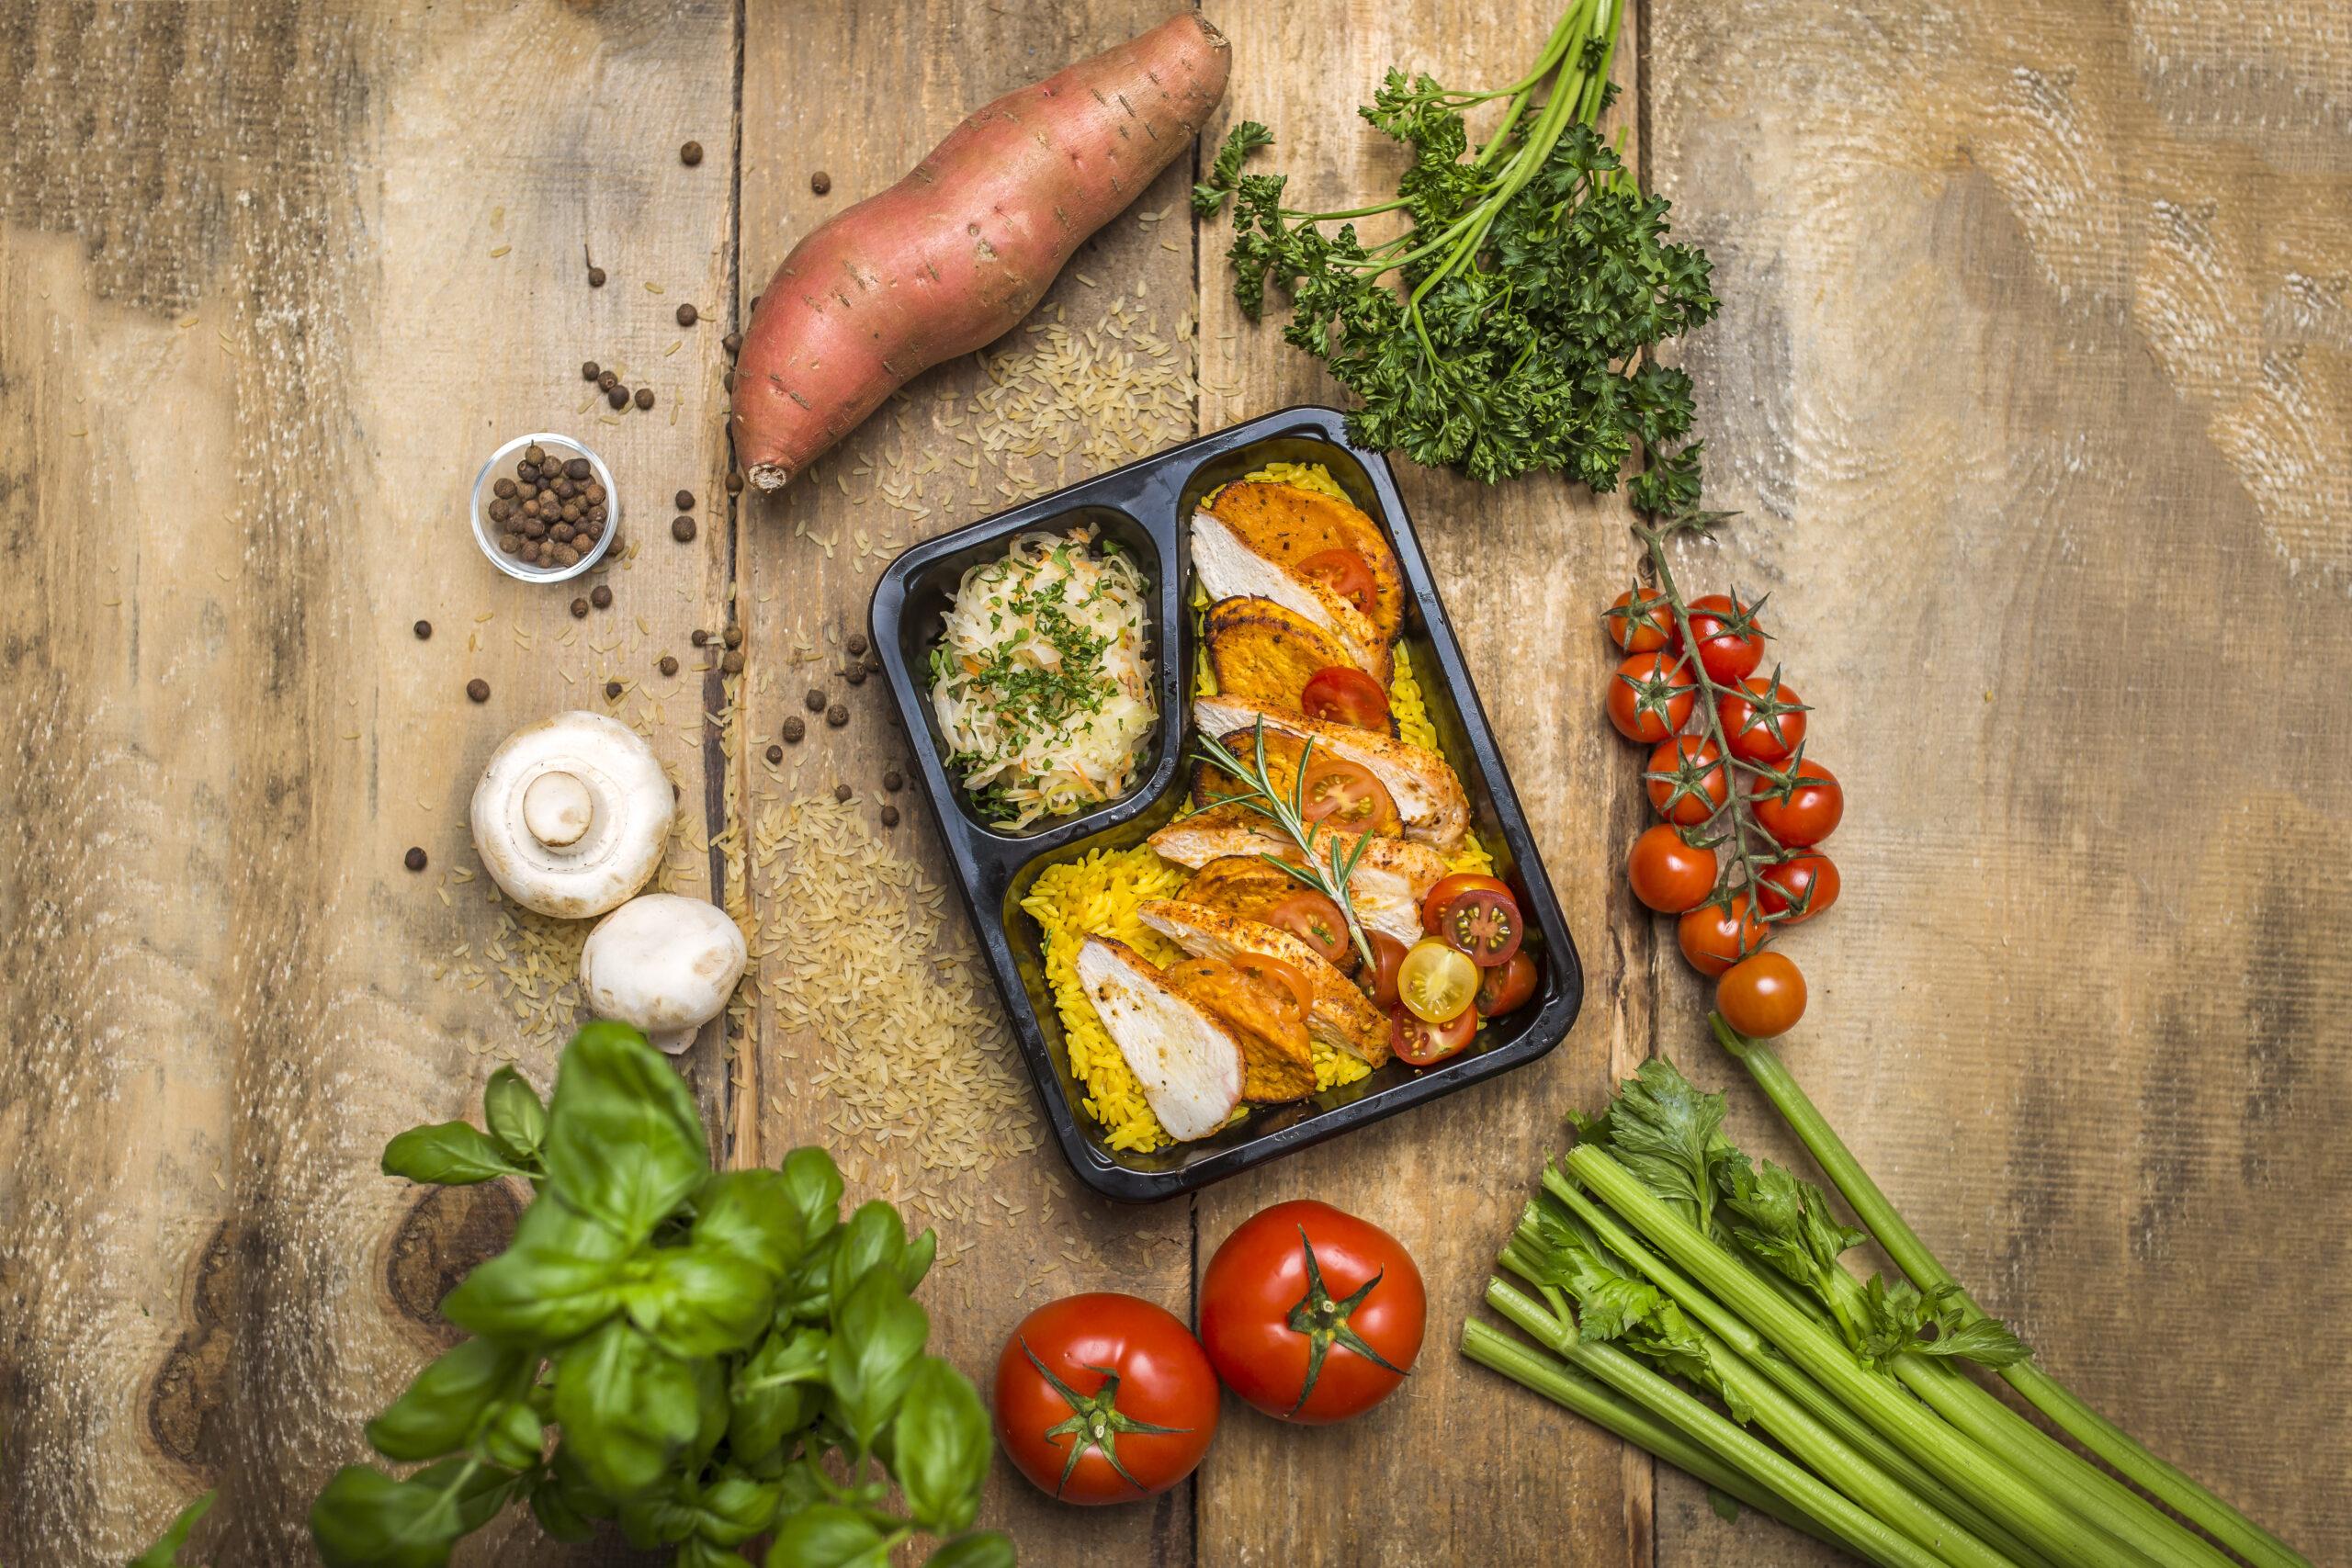 Tani Catering Dietetyczny Ossy